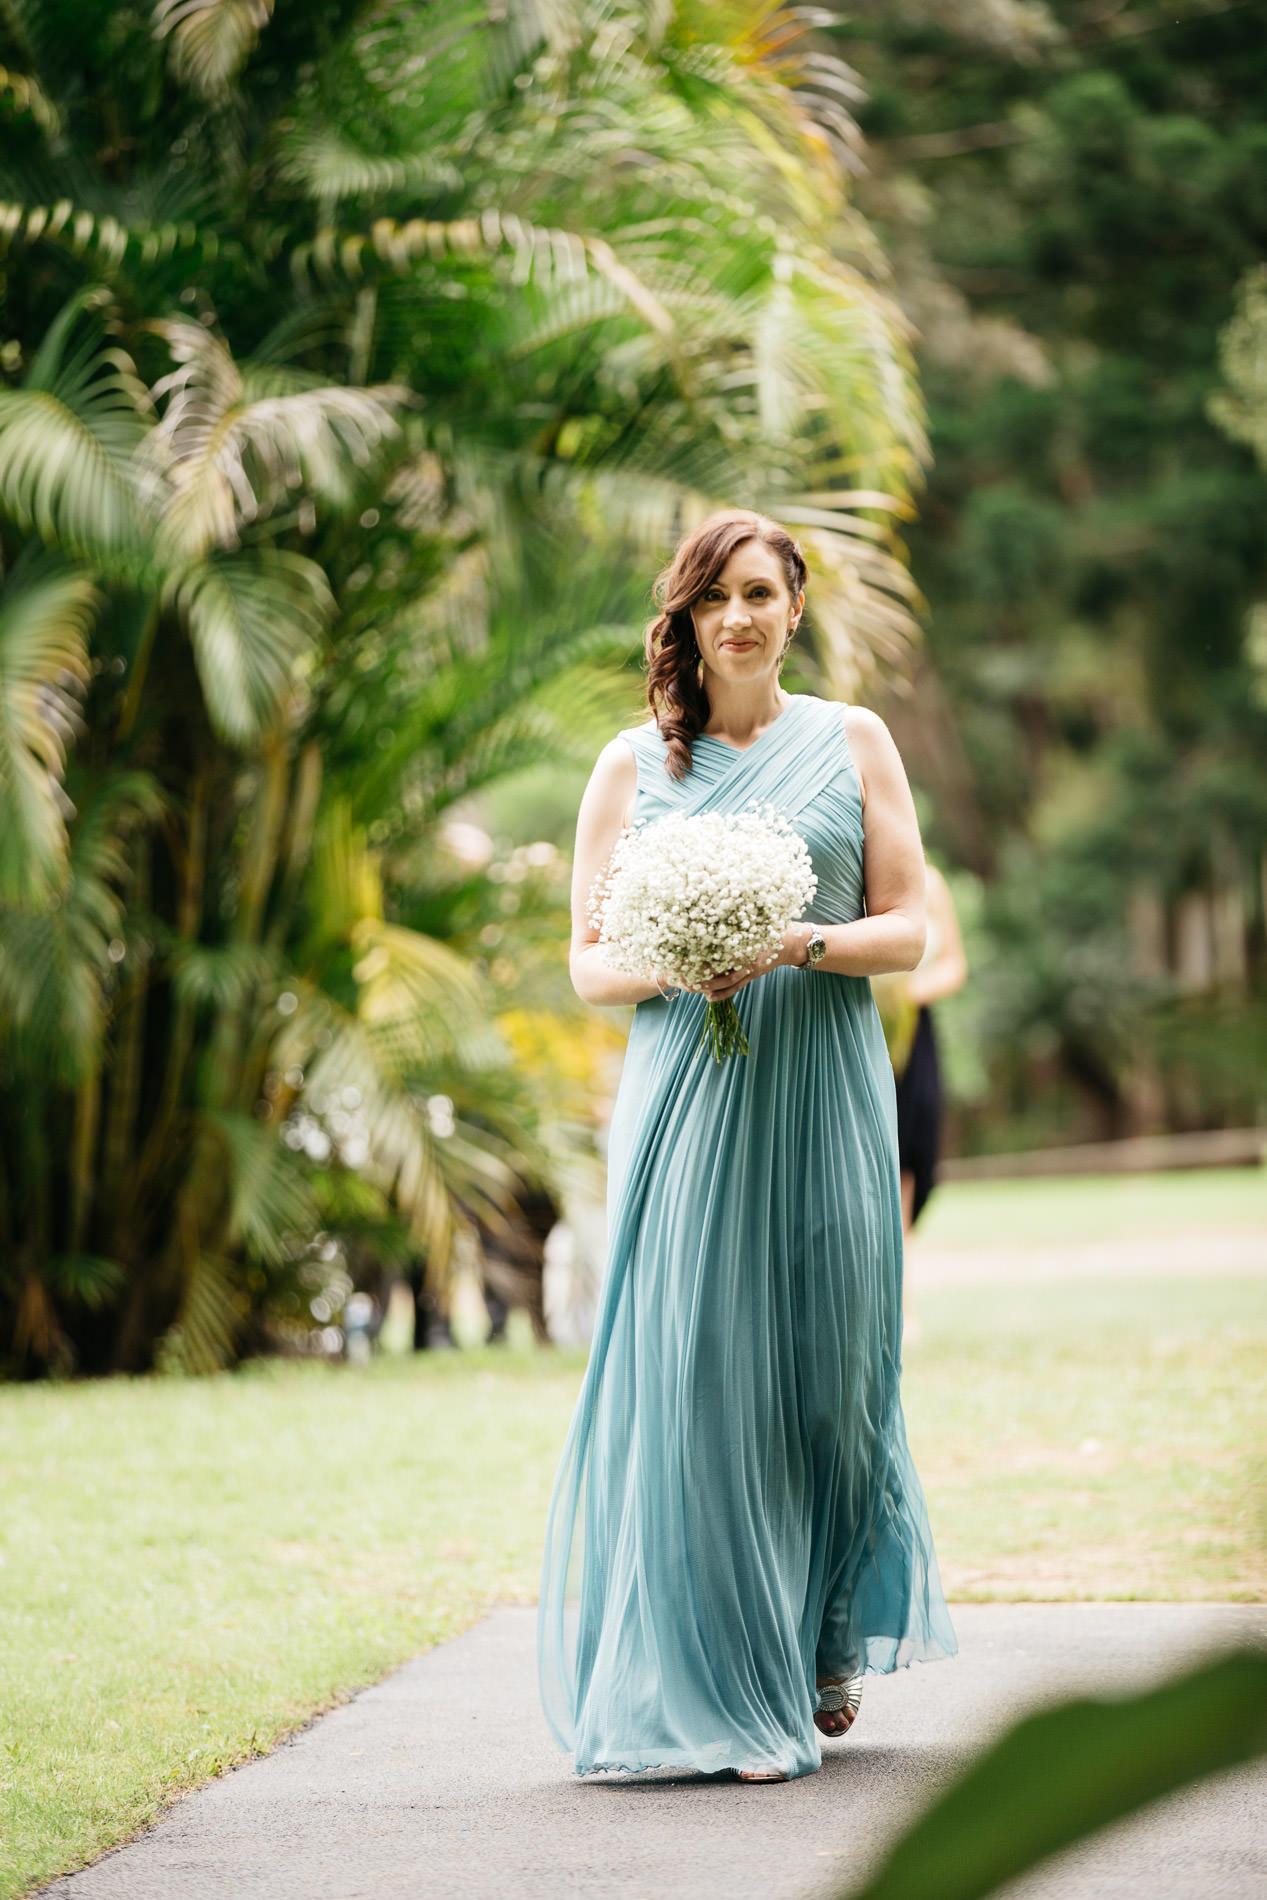 True North Photography_Boomerang Farm_Stacey and Isaac_Gold Coast Wedding_Barm Wedding_Hinterland Wedding-70.jpg